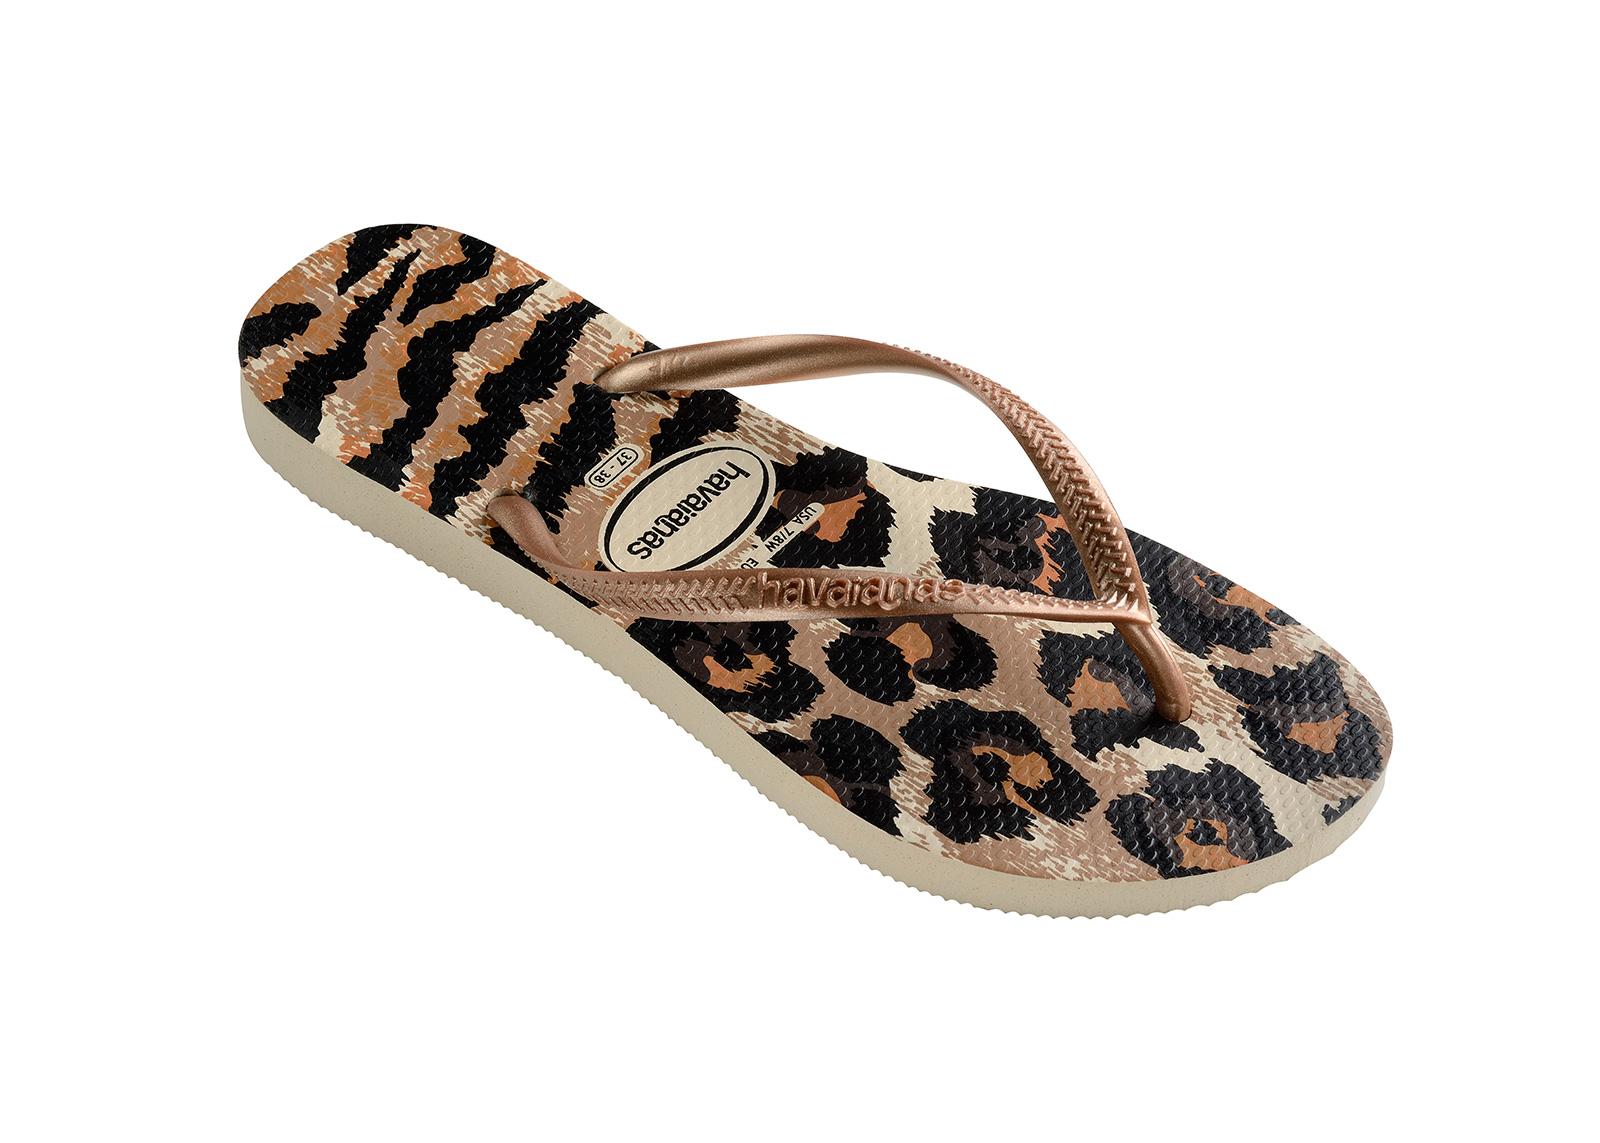 876ec819e Flip-Flops Flip-flops - Havaianas Slim Animals Beige rose Gold